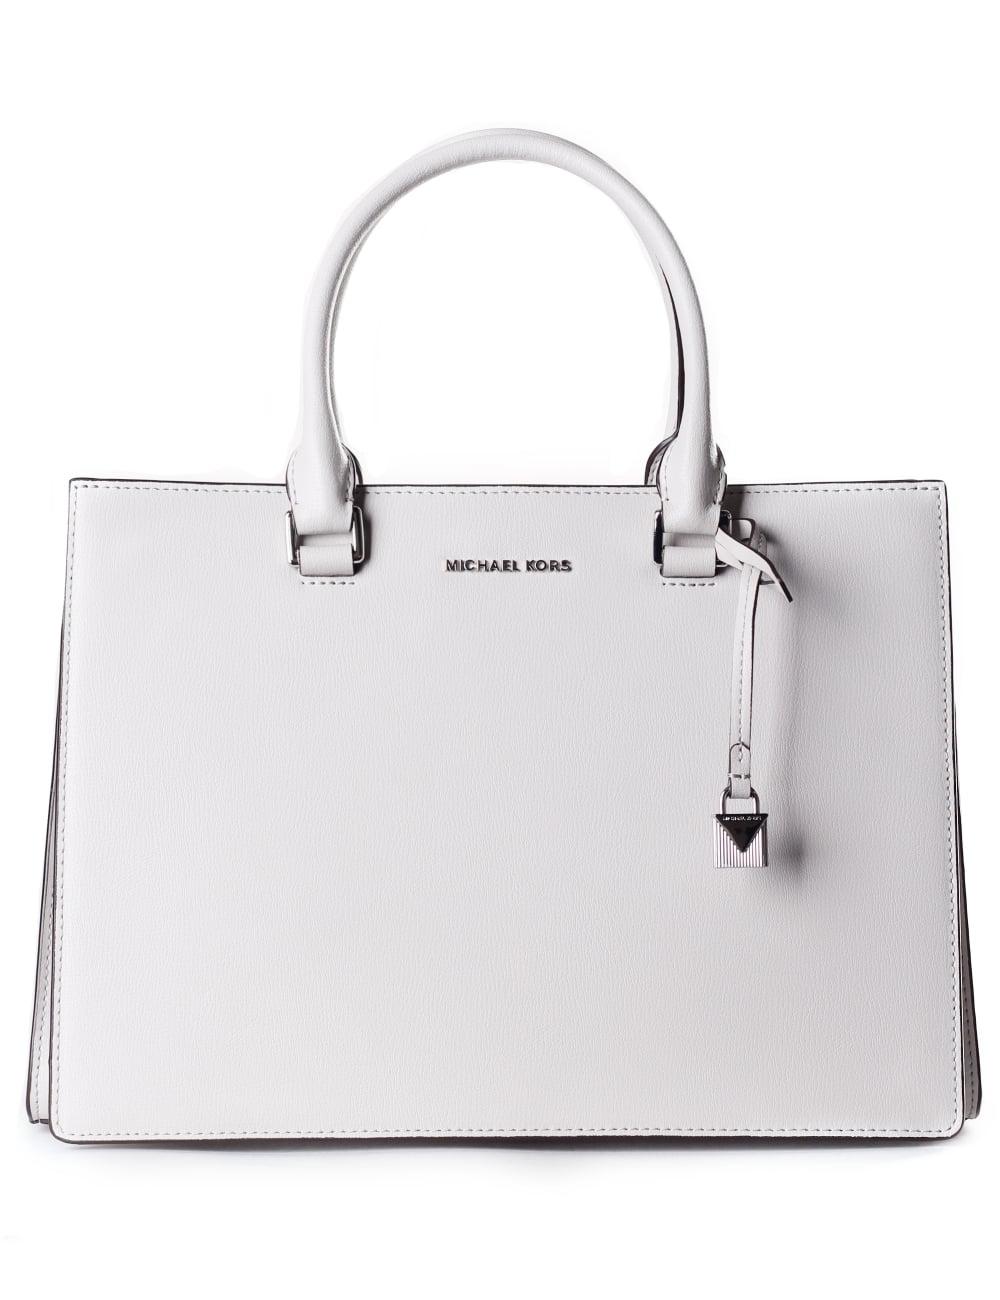 f7a7496bc10e6 Michael Kors Women s Medium Sutton Gusset Satchel Bag